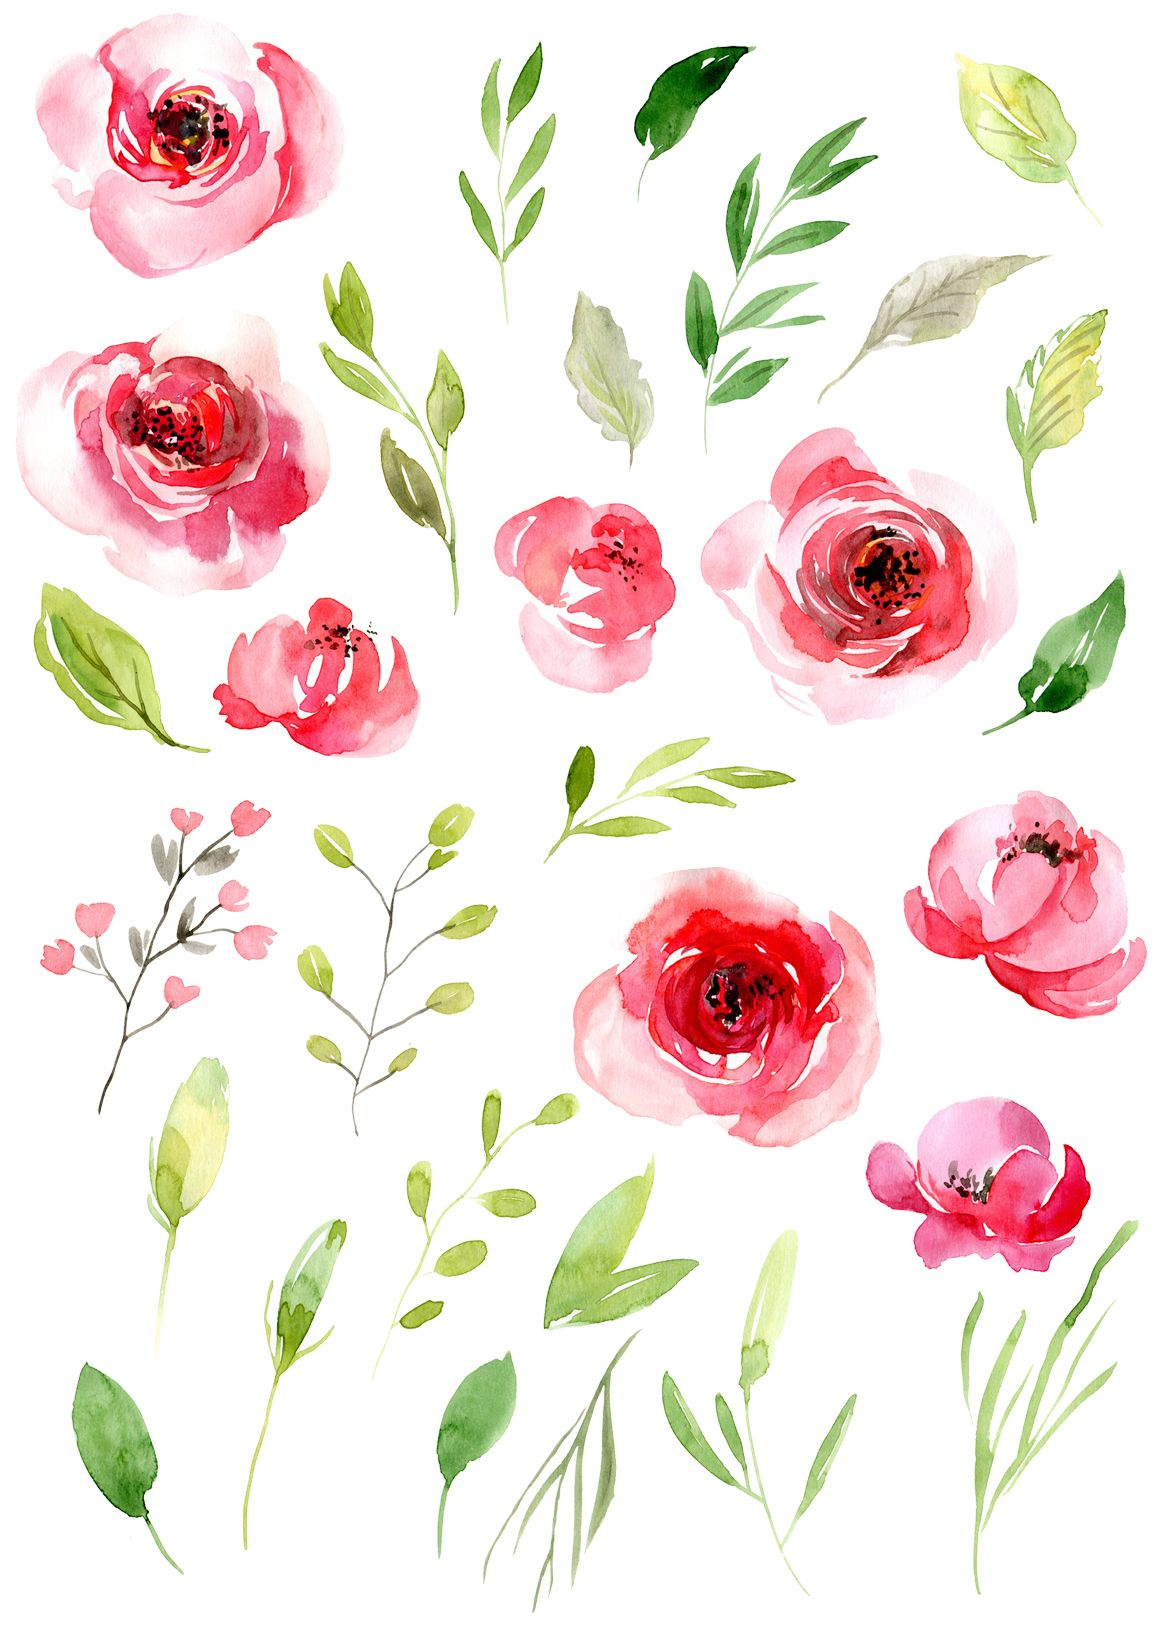 Watercolor Pink Roses Flowers Leaves Png 48989 Illustrations Design Bundles Watercolor Flowers Floral Watercolor Watercolor Rose